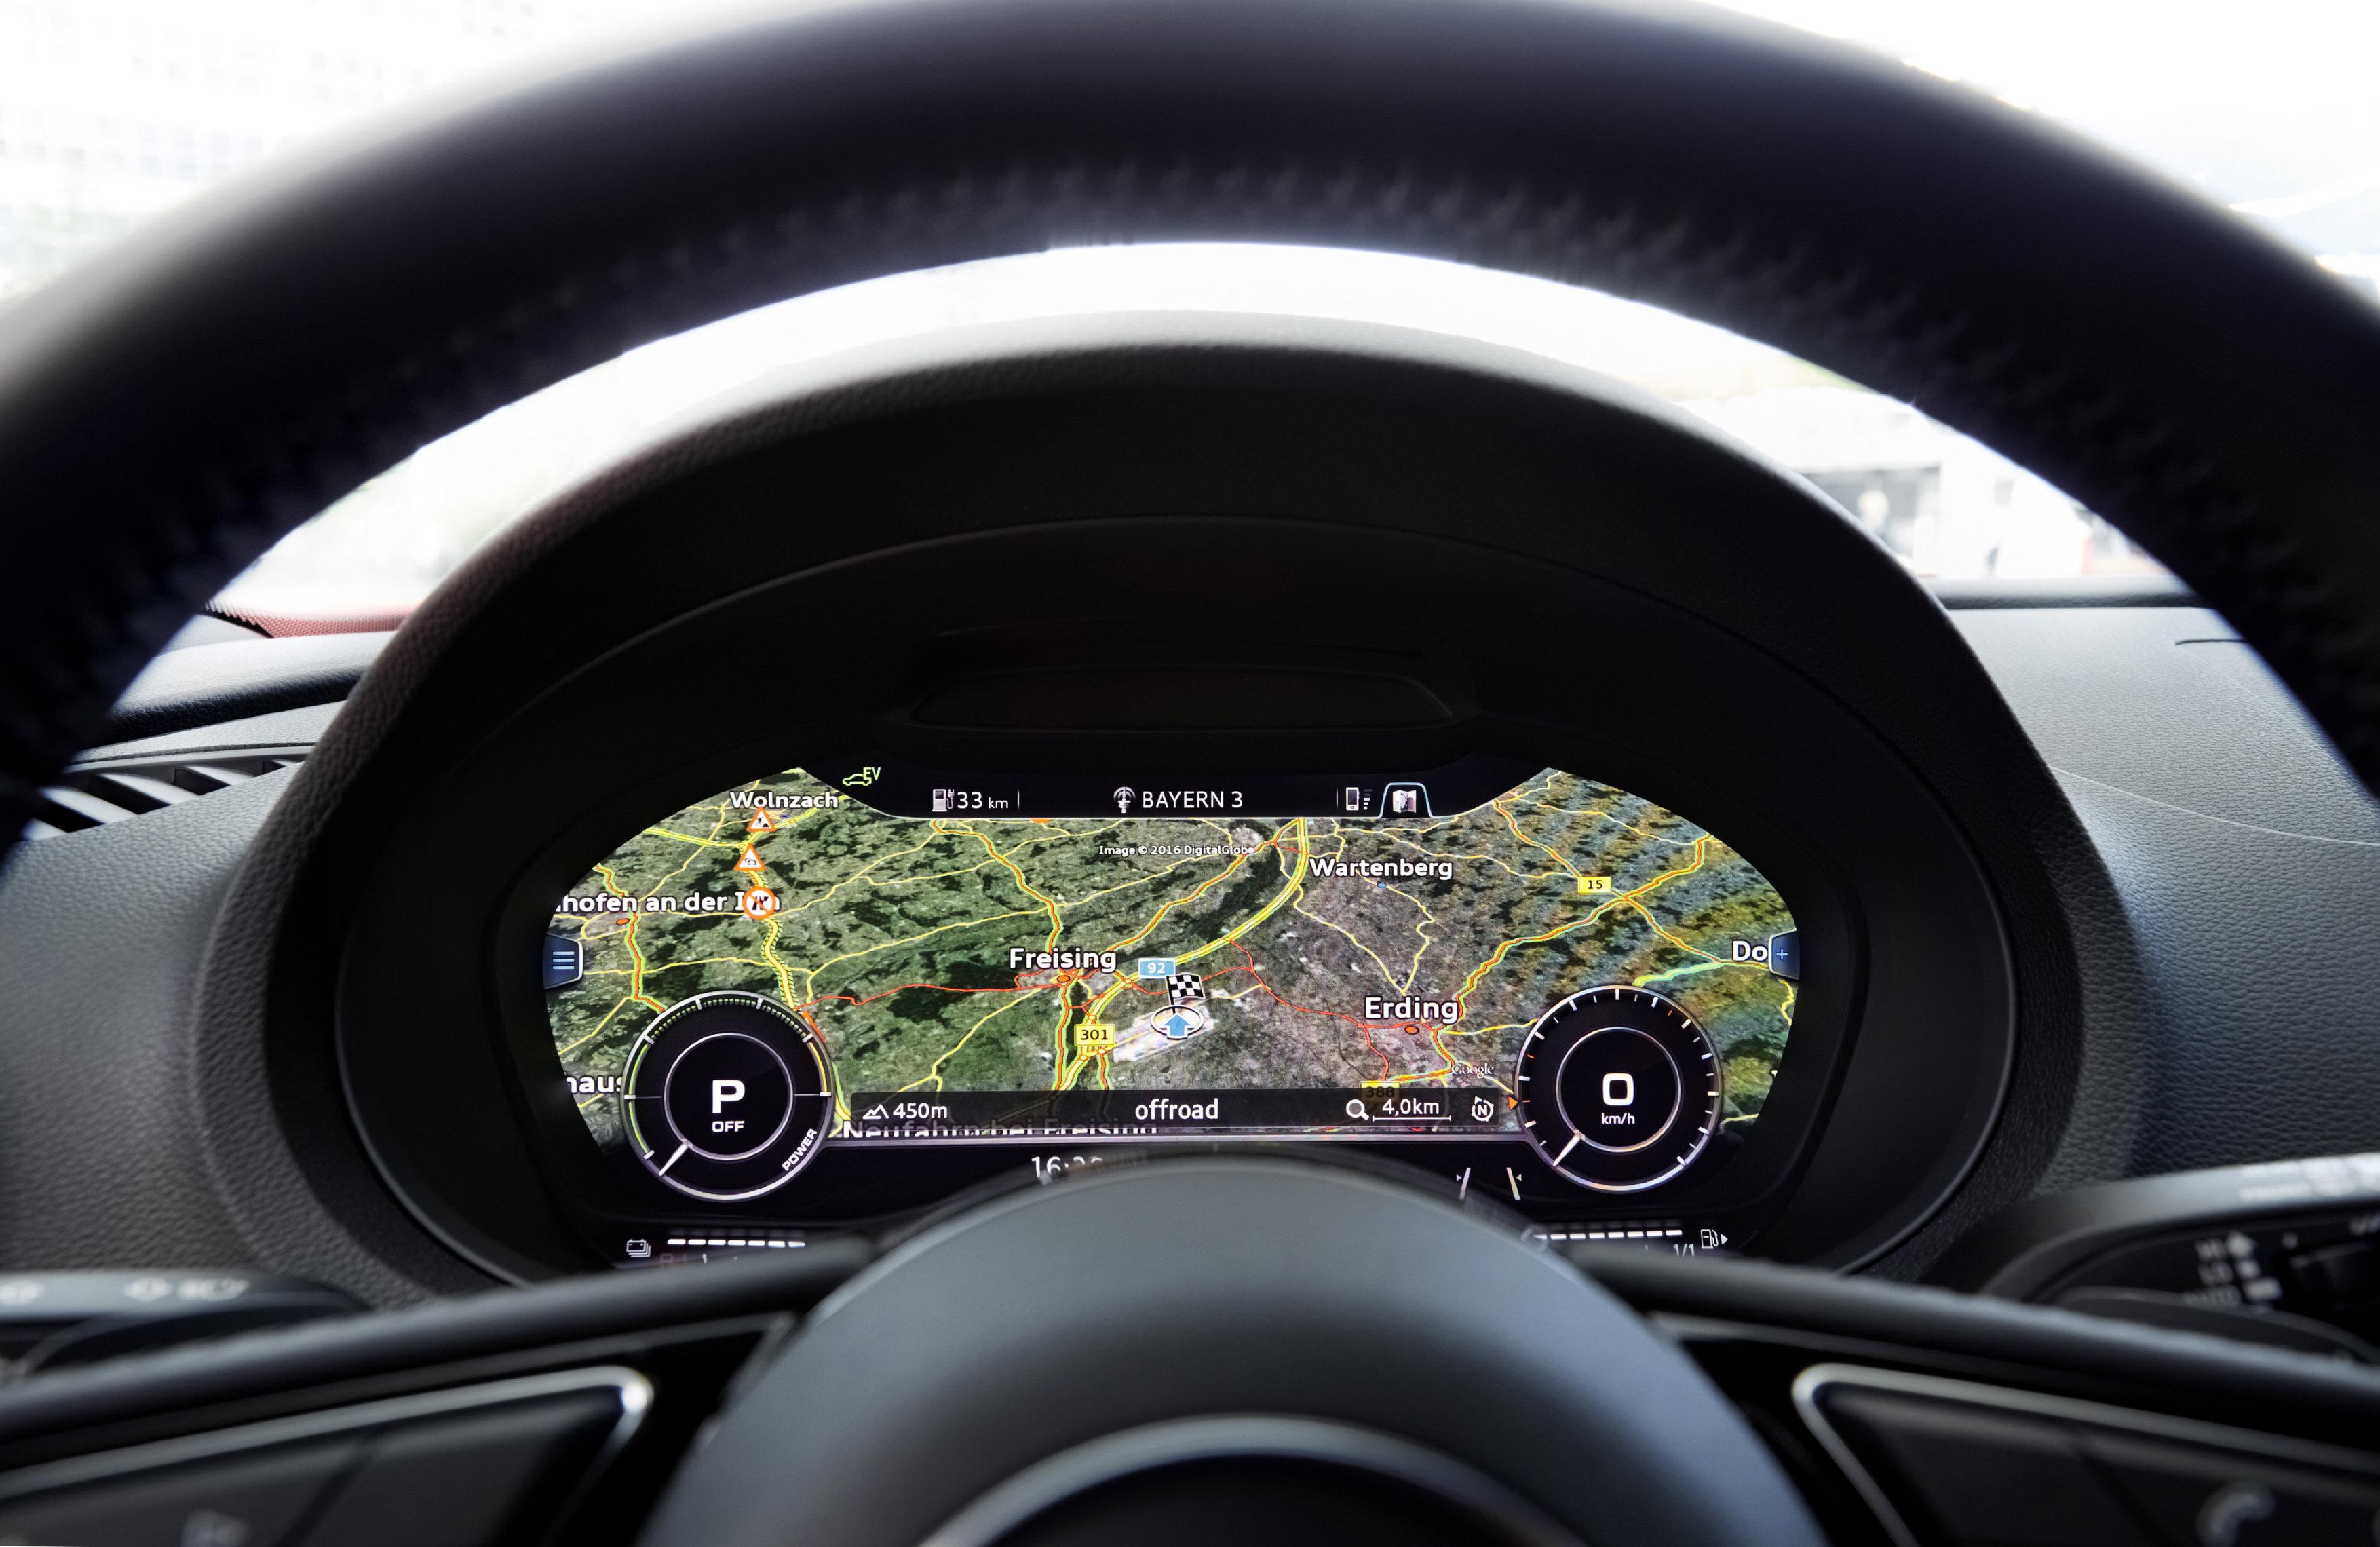 audi virtual cockpit google earth audi a3 e tron audi. Black Bedroom Furniture Sets. Home Design Ideas